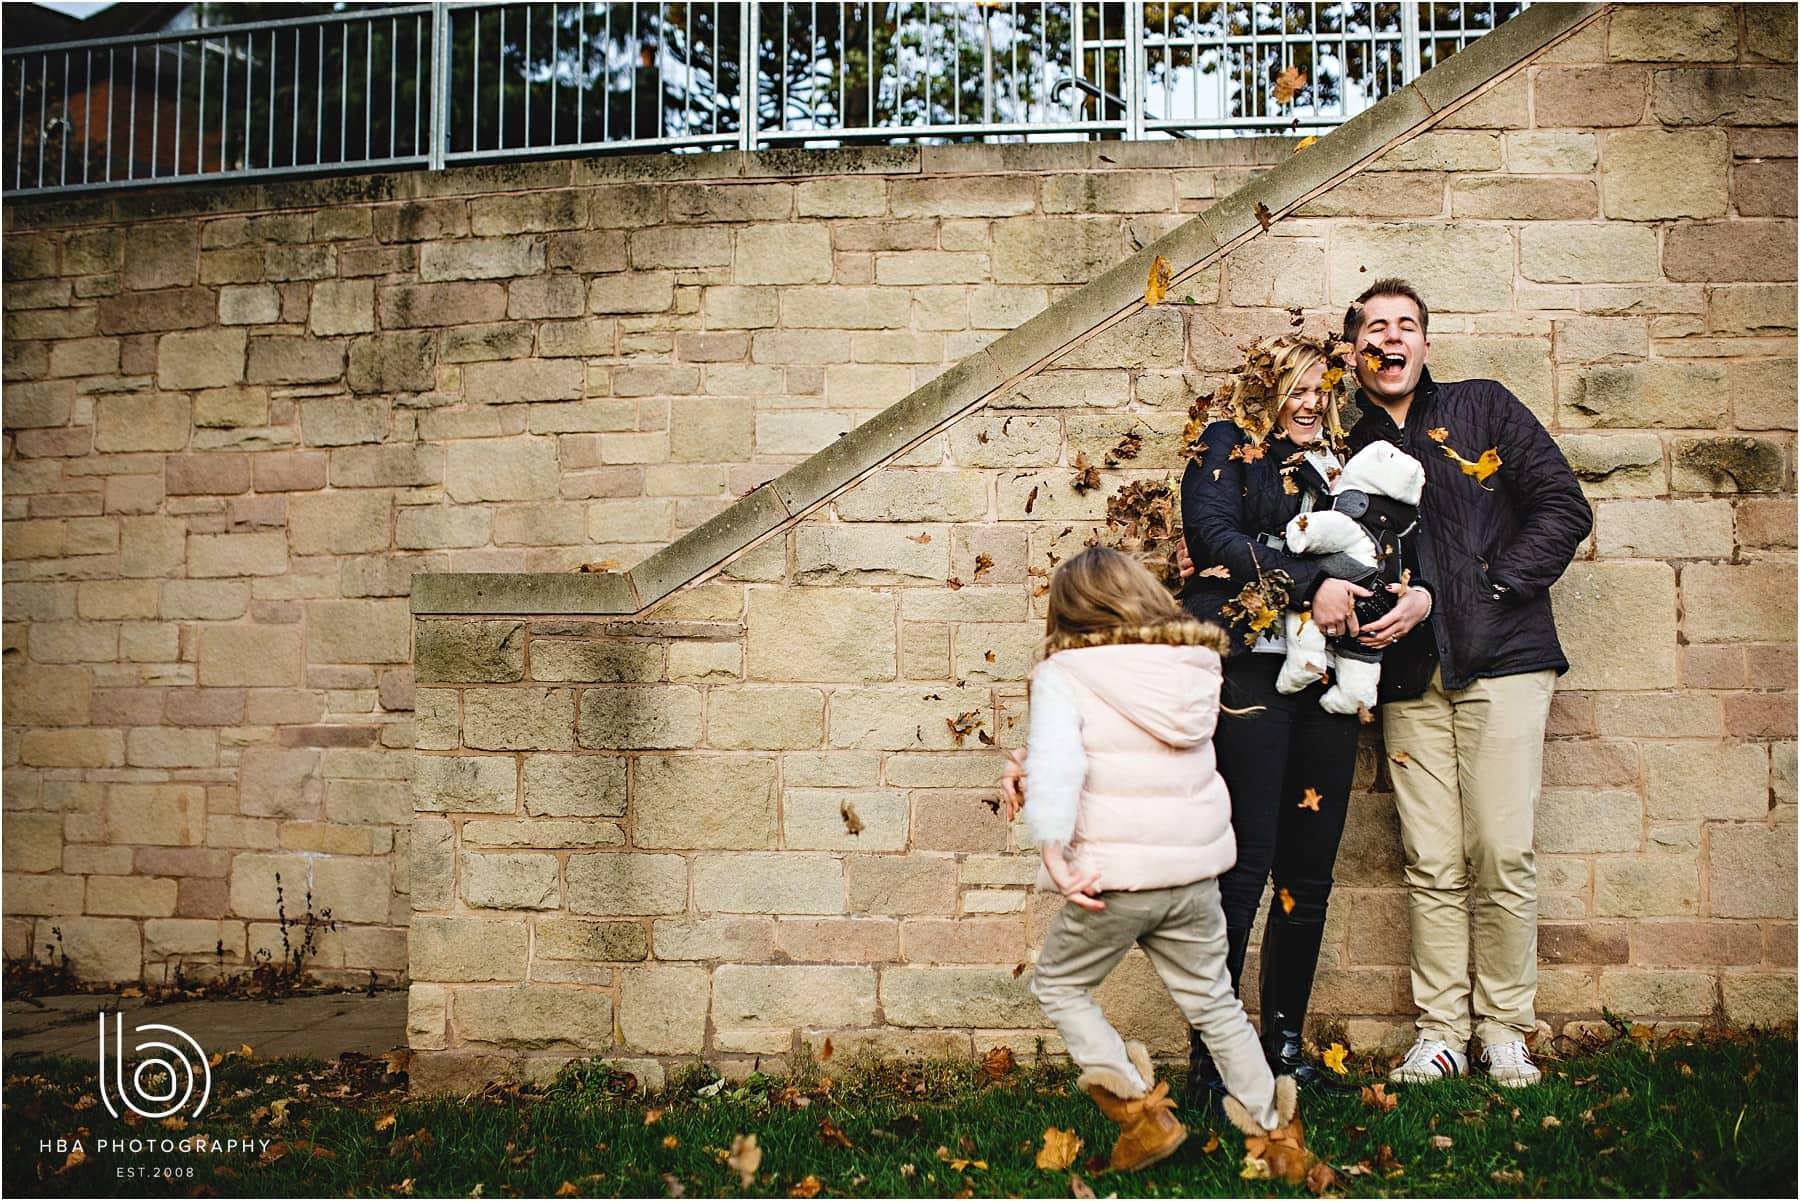 the-bainbridge-family-photos-in-derbyshire_0012